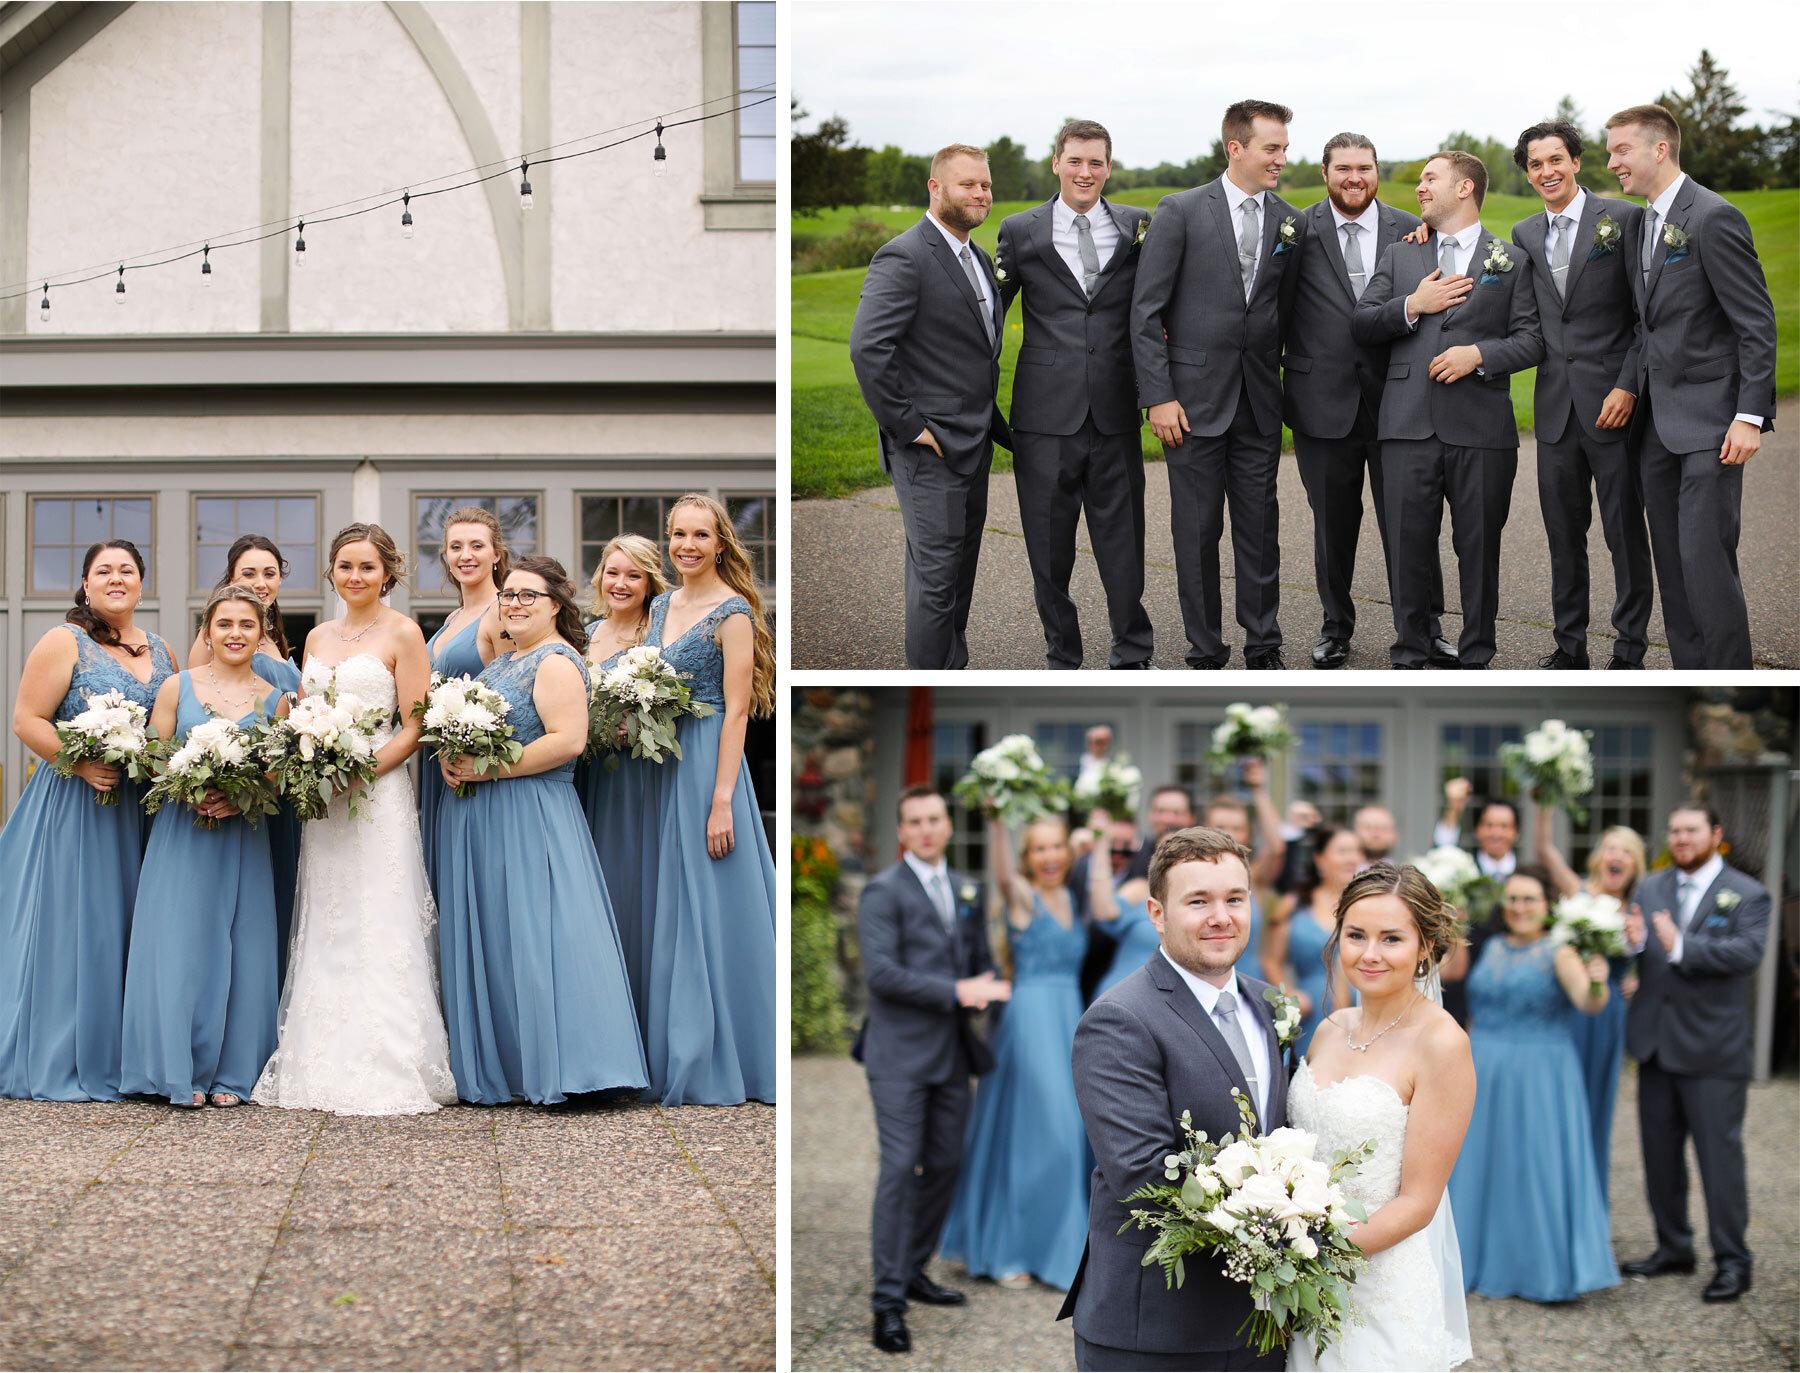 05-Vick-Photography-Minneapolis-Minnesota-Wedding-Rush-Creek-Golf-Club-Groom-Bride-Bridesmaids-Groomsmen-Amanda-and-Michael.jpg